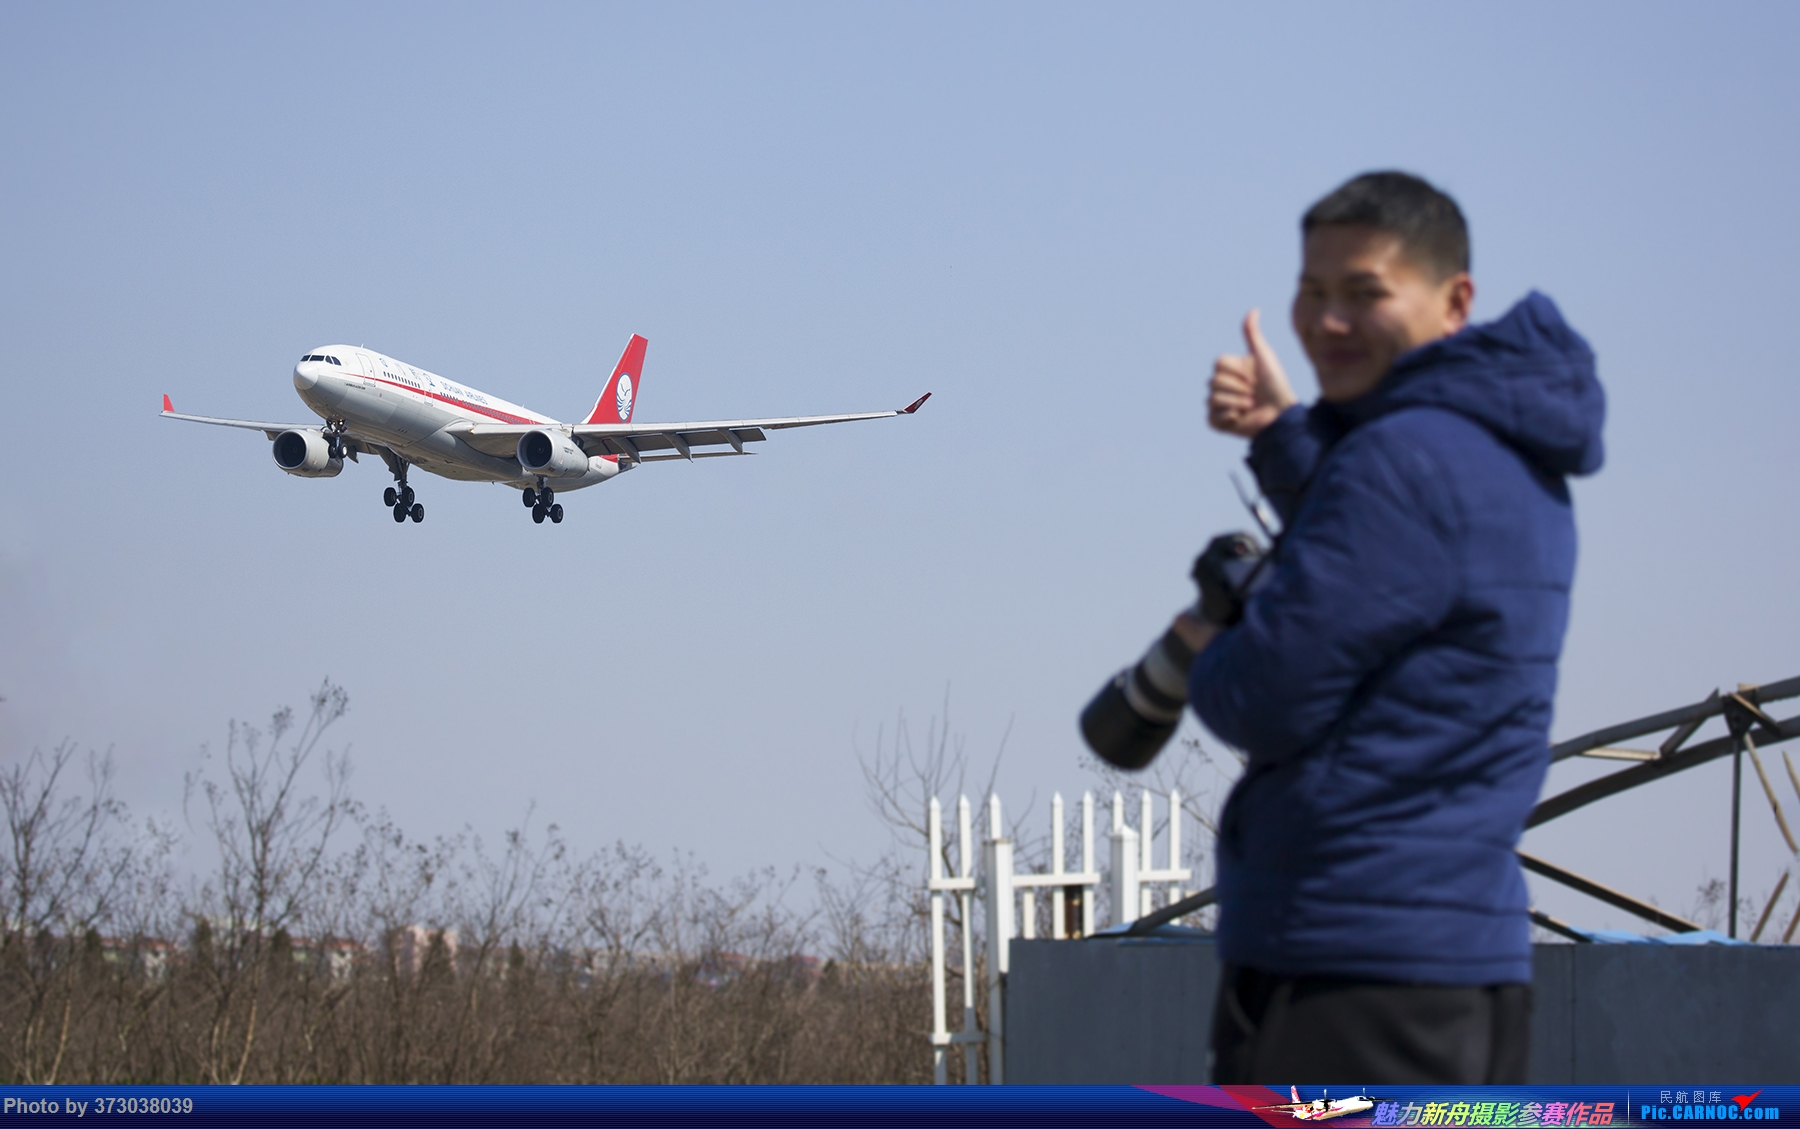 Re:[原创]【杭州飞友会】妖风后的杭城通透蓝,荷航海航厦航787落地萧山机场 AIRBUS A330-200 B-2729 中国杭州萧山国际机场  CARNOC网友